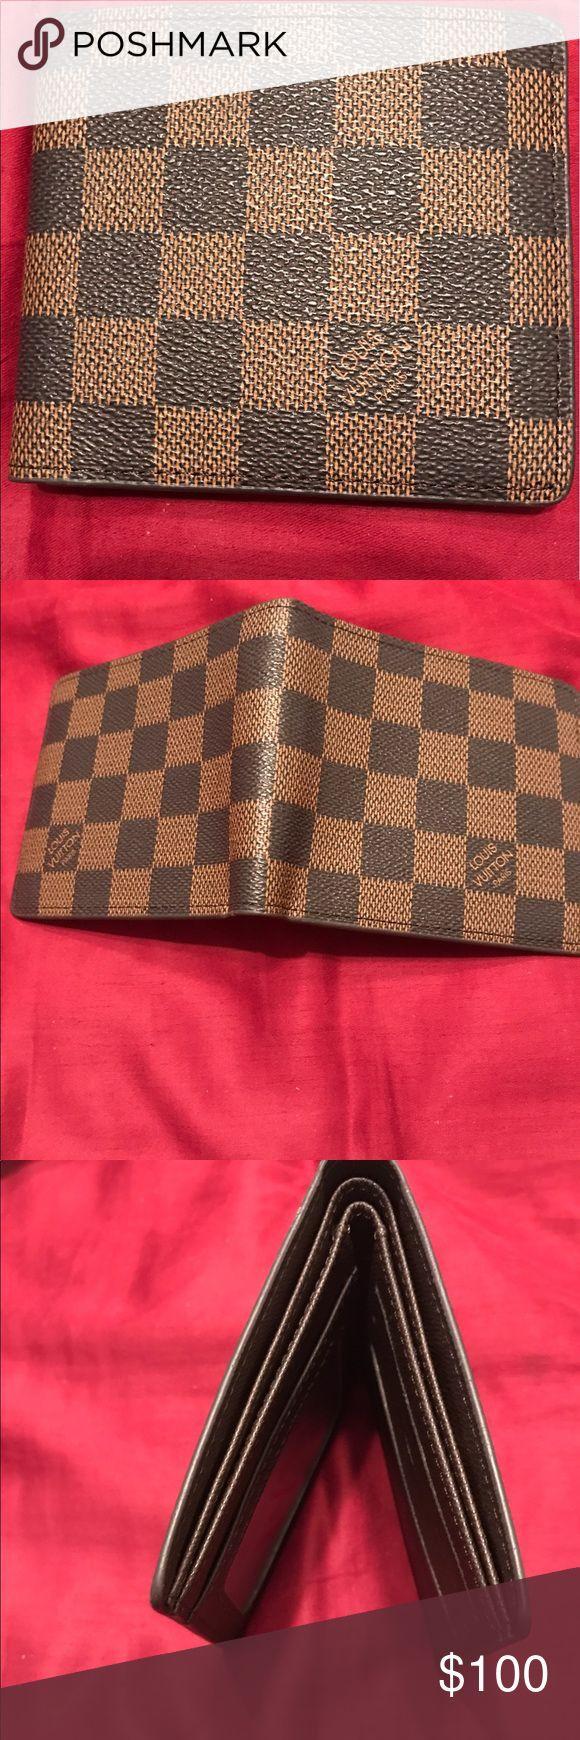 "Marco Damier Canvas Leather Bifold Mens Wallet Marco Damier Canvas Leather Bifold Mens Wallet     4.1""L x 4""H x 1""W. Louis Vuitton Bags Wallets"